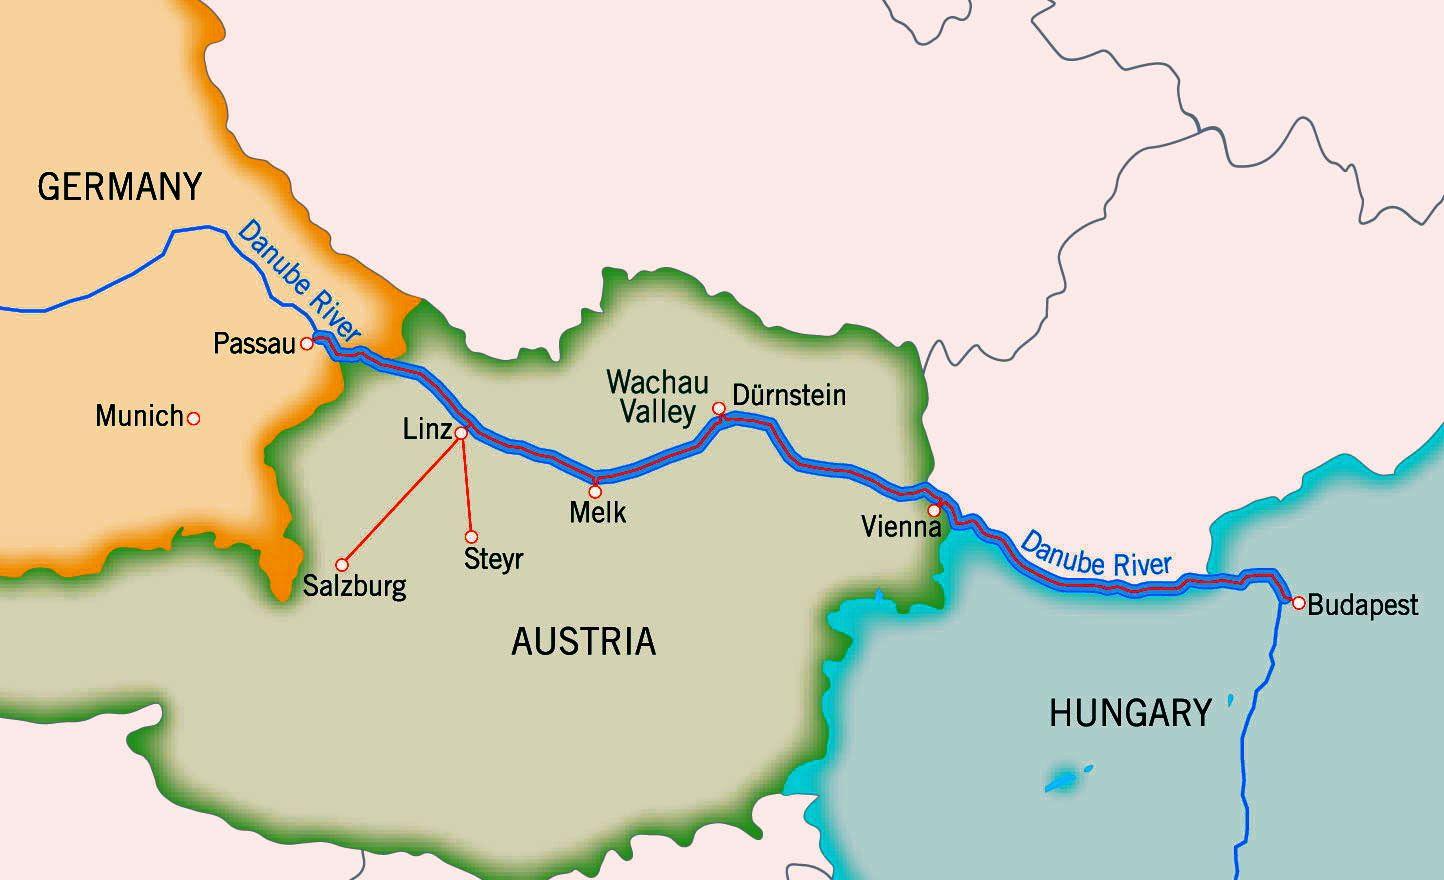 Wachau valley austria google search austria pinterest wachau valley austria google search gumiabroncs Gallery